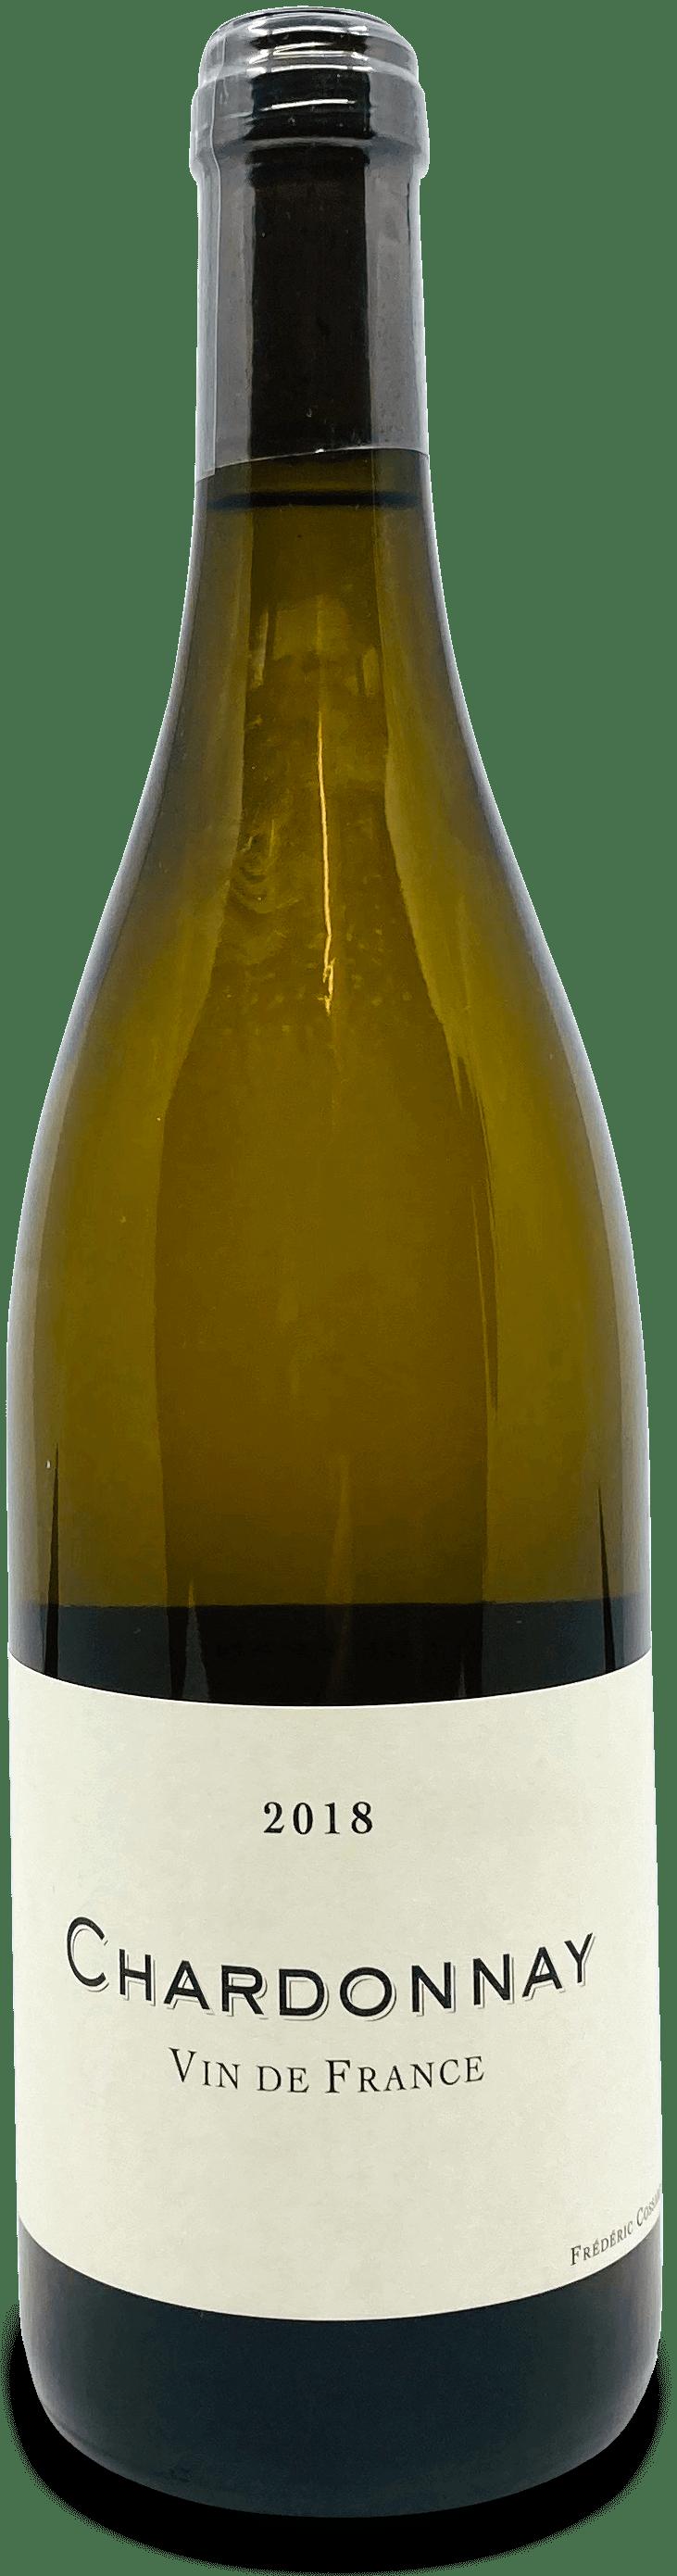 Chardonnay - Vinsupernaturel